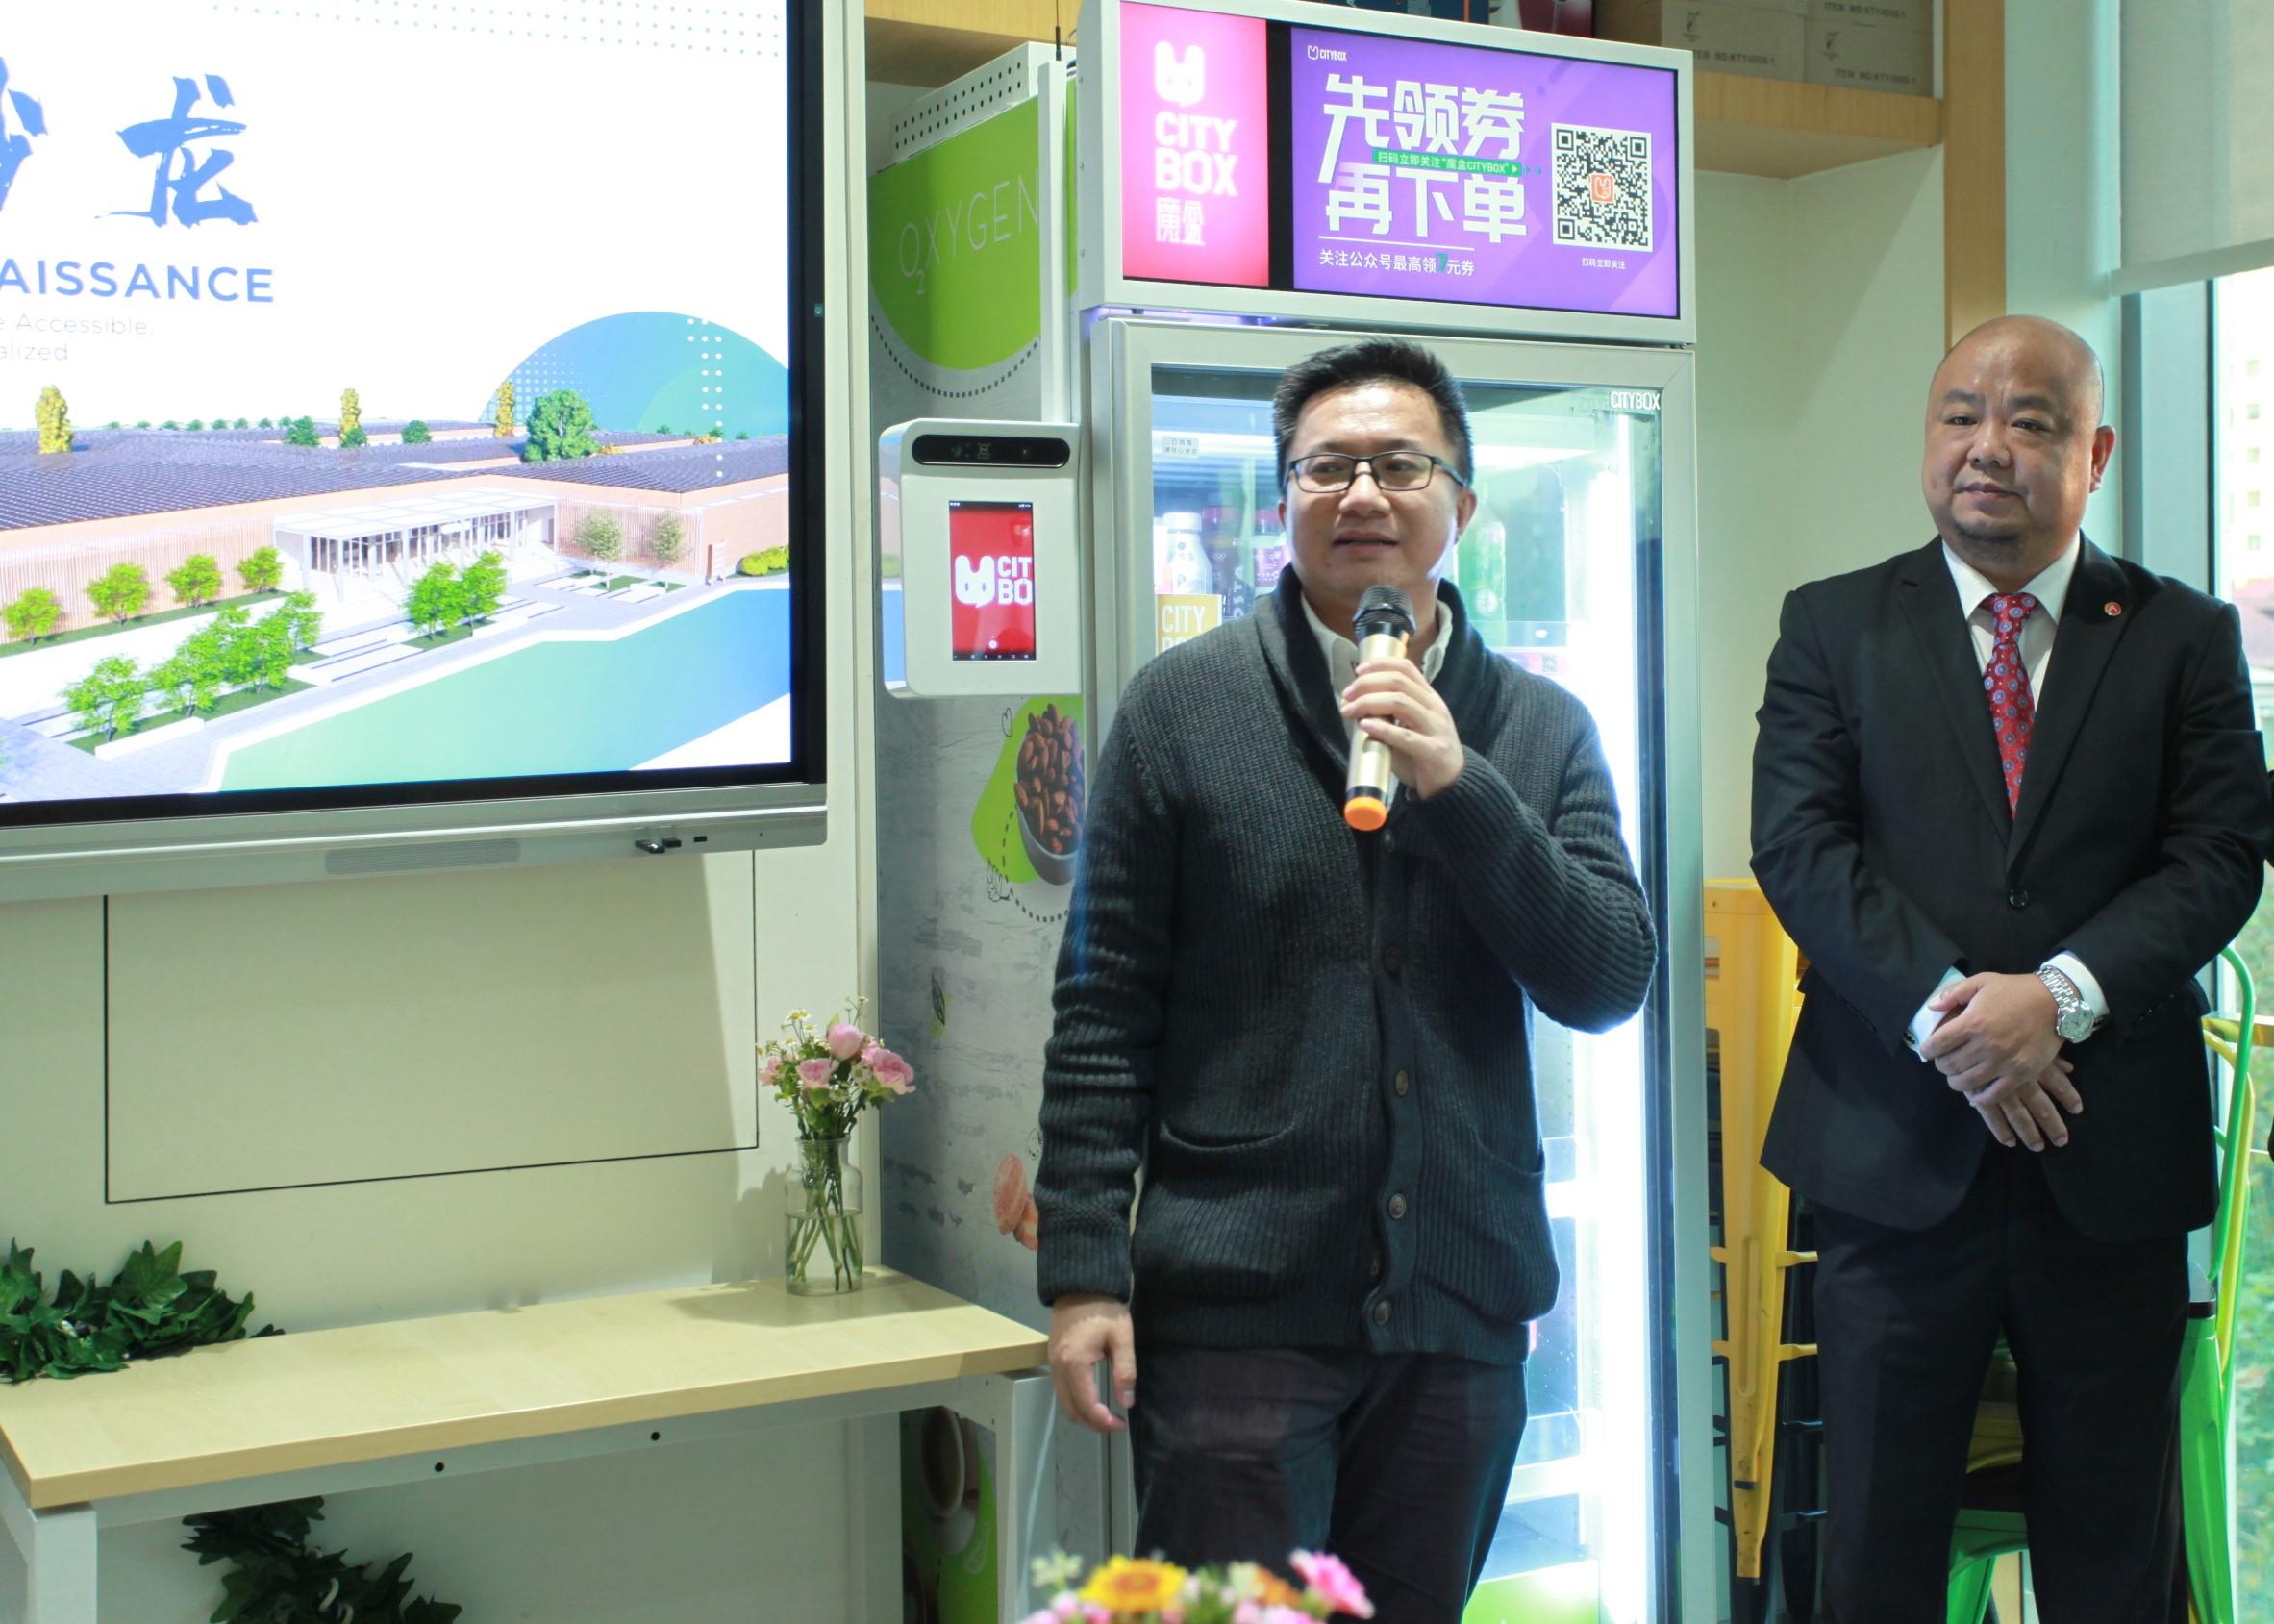 Pu Chuanhai, the Associate Dean of Shanghai Jiao Tong University School of Medicine